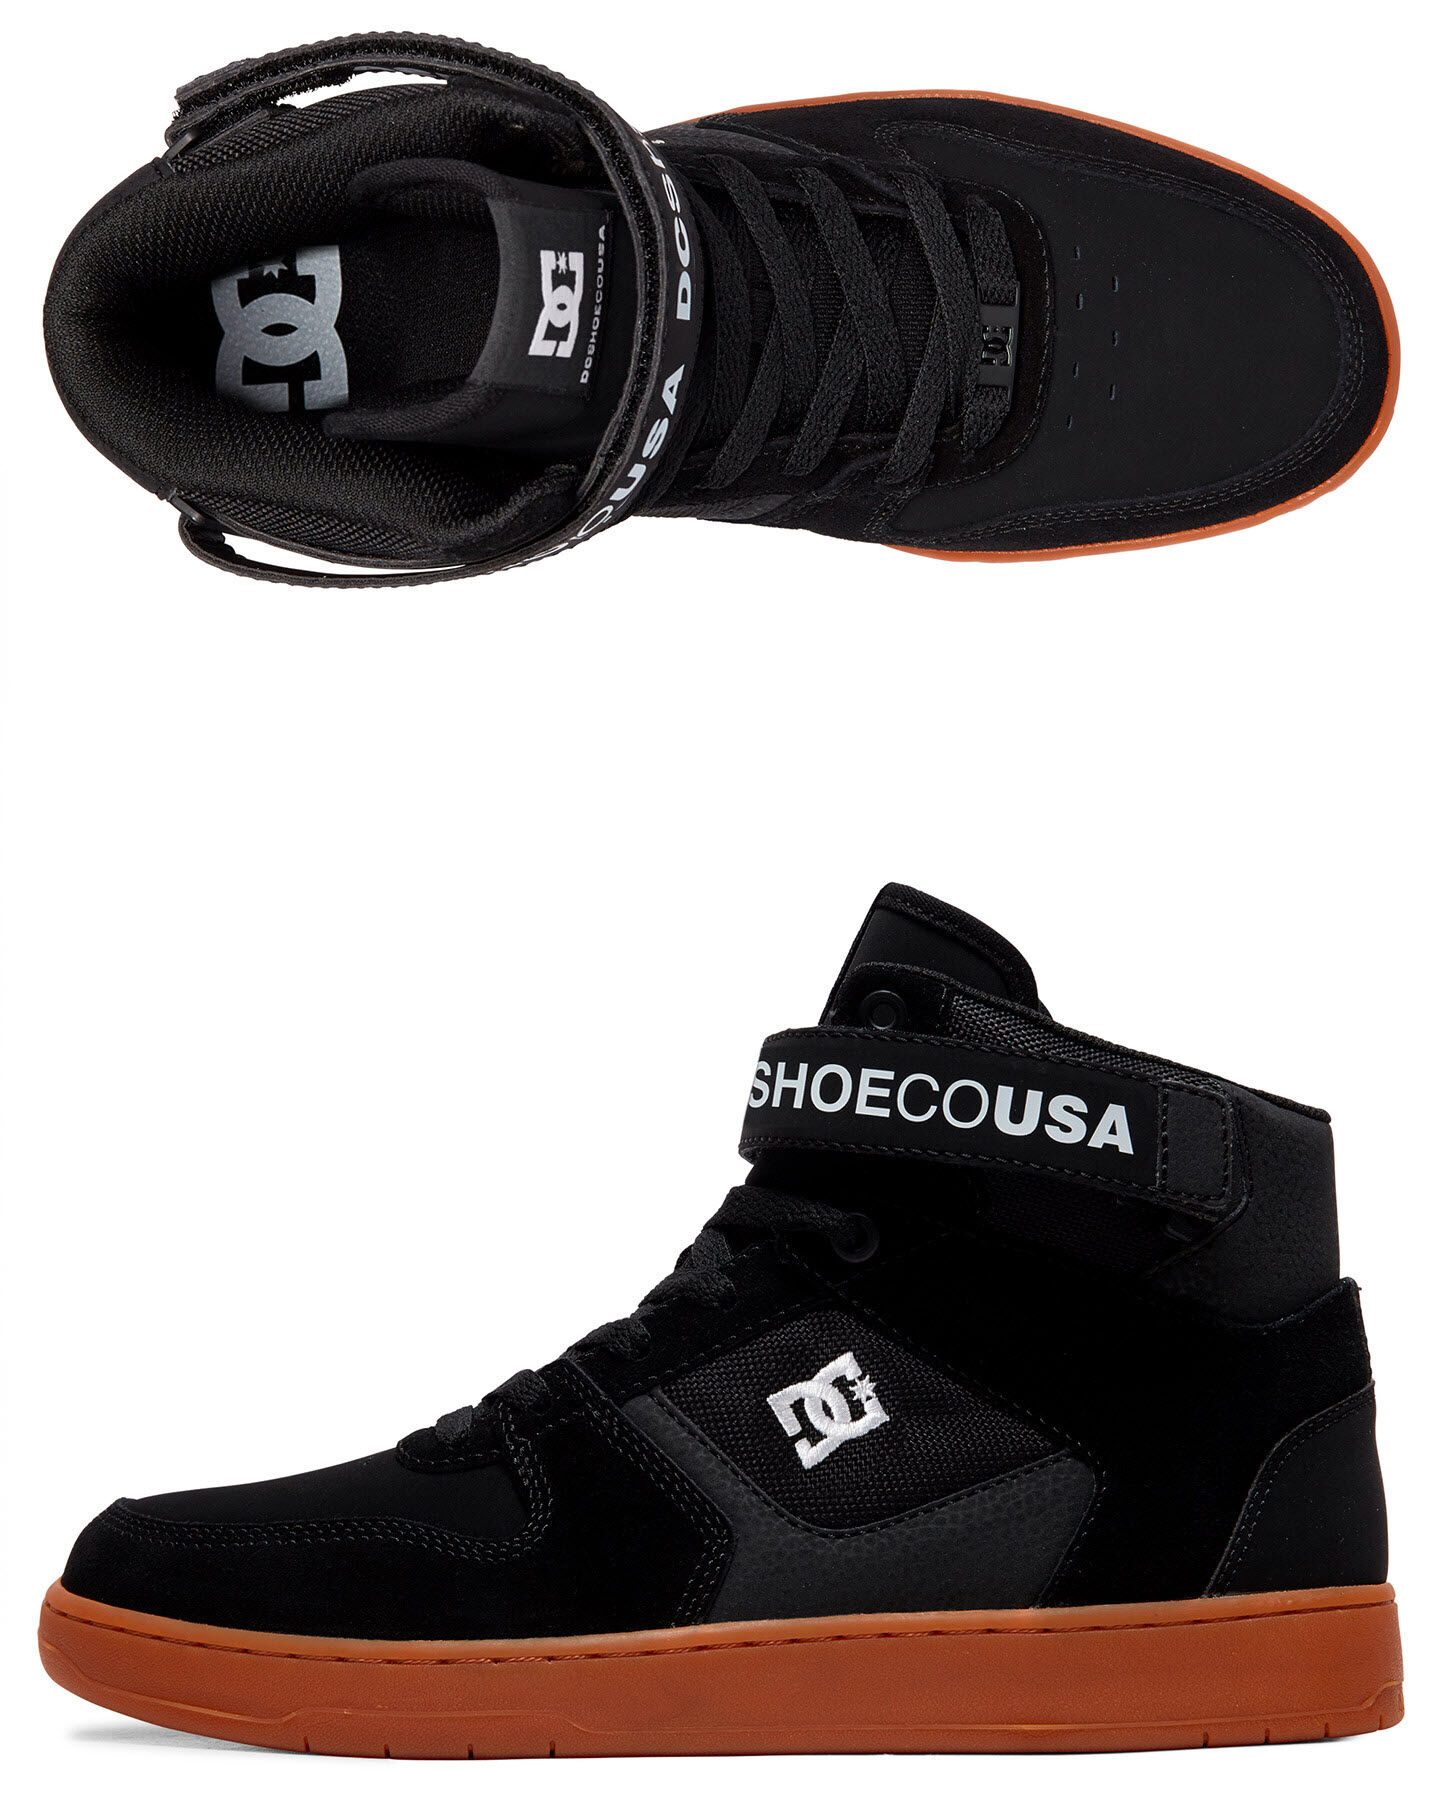 Dc Shoes Mens Pensford High Top Shoe